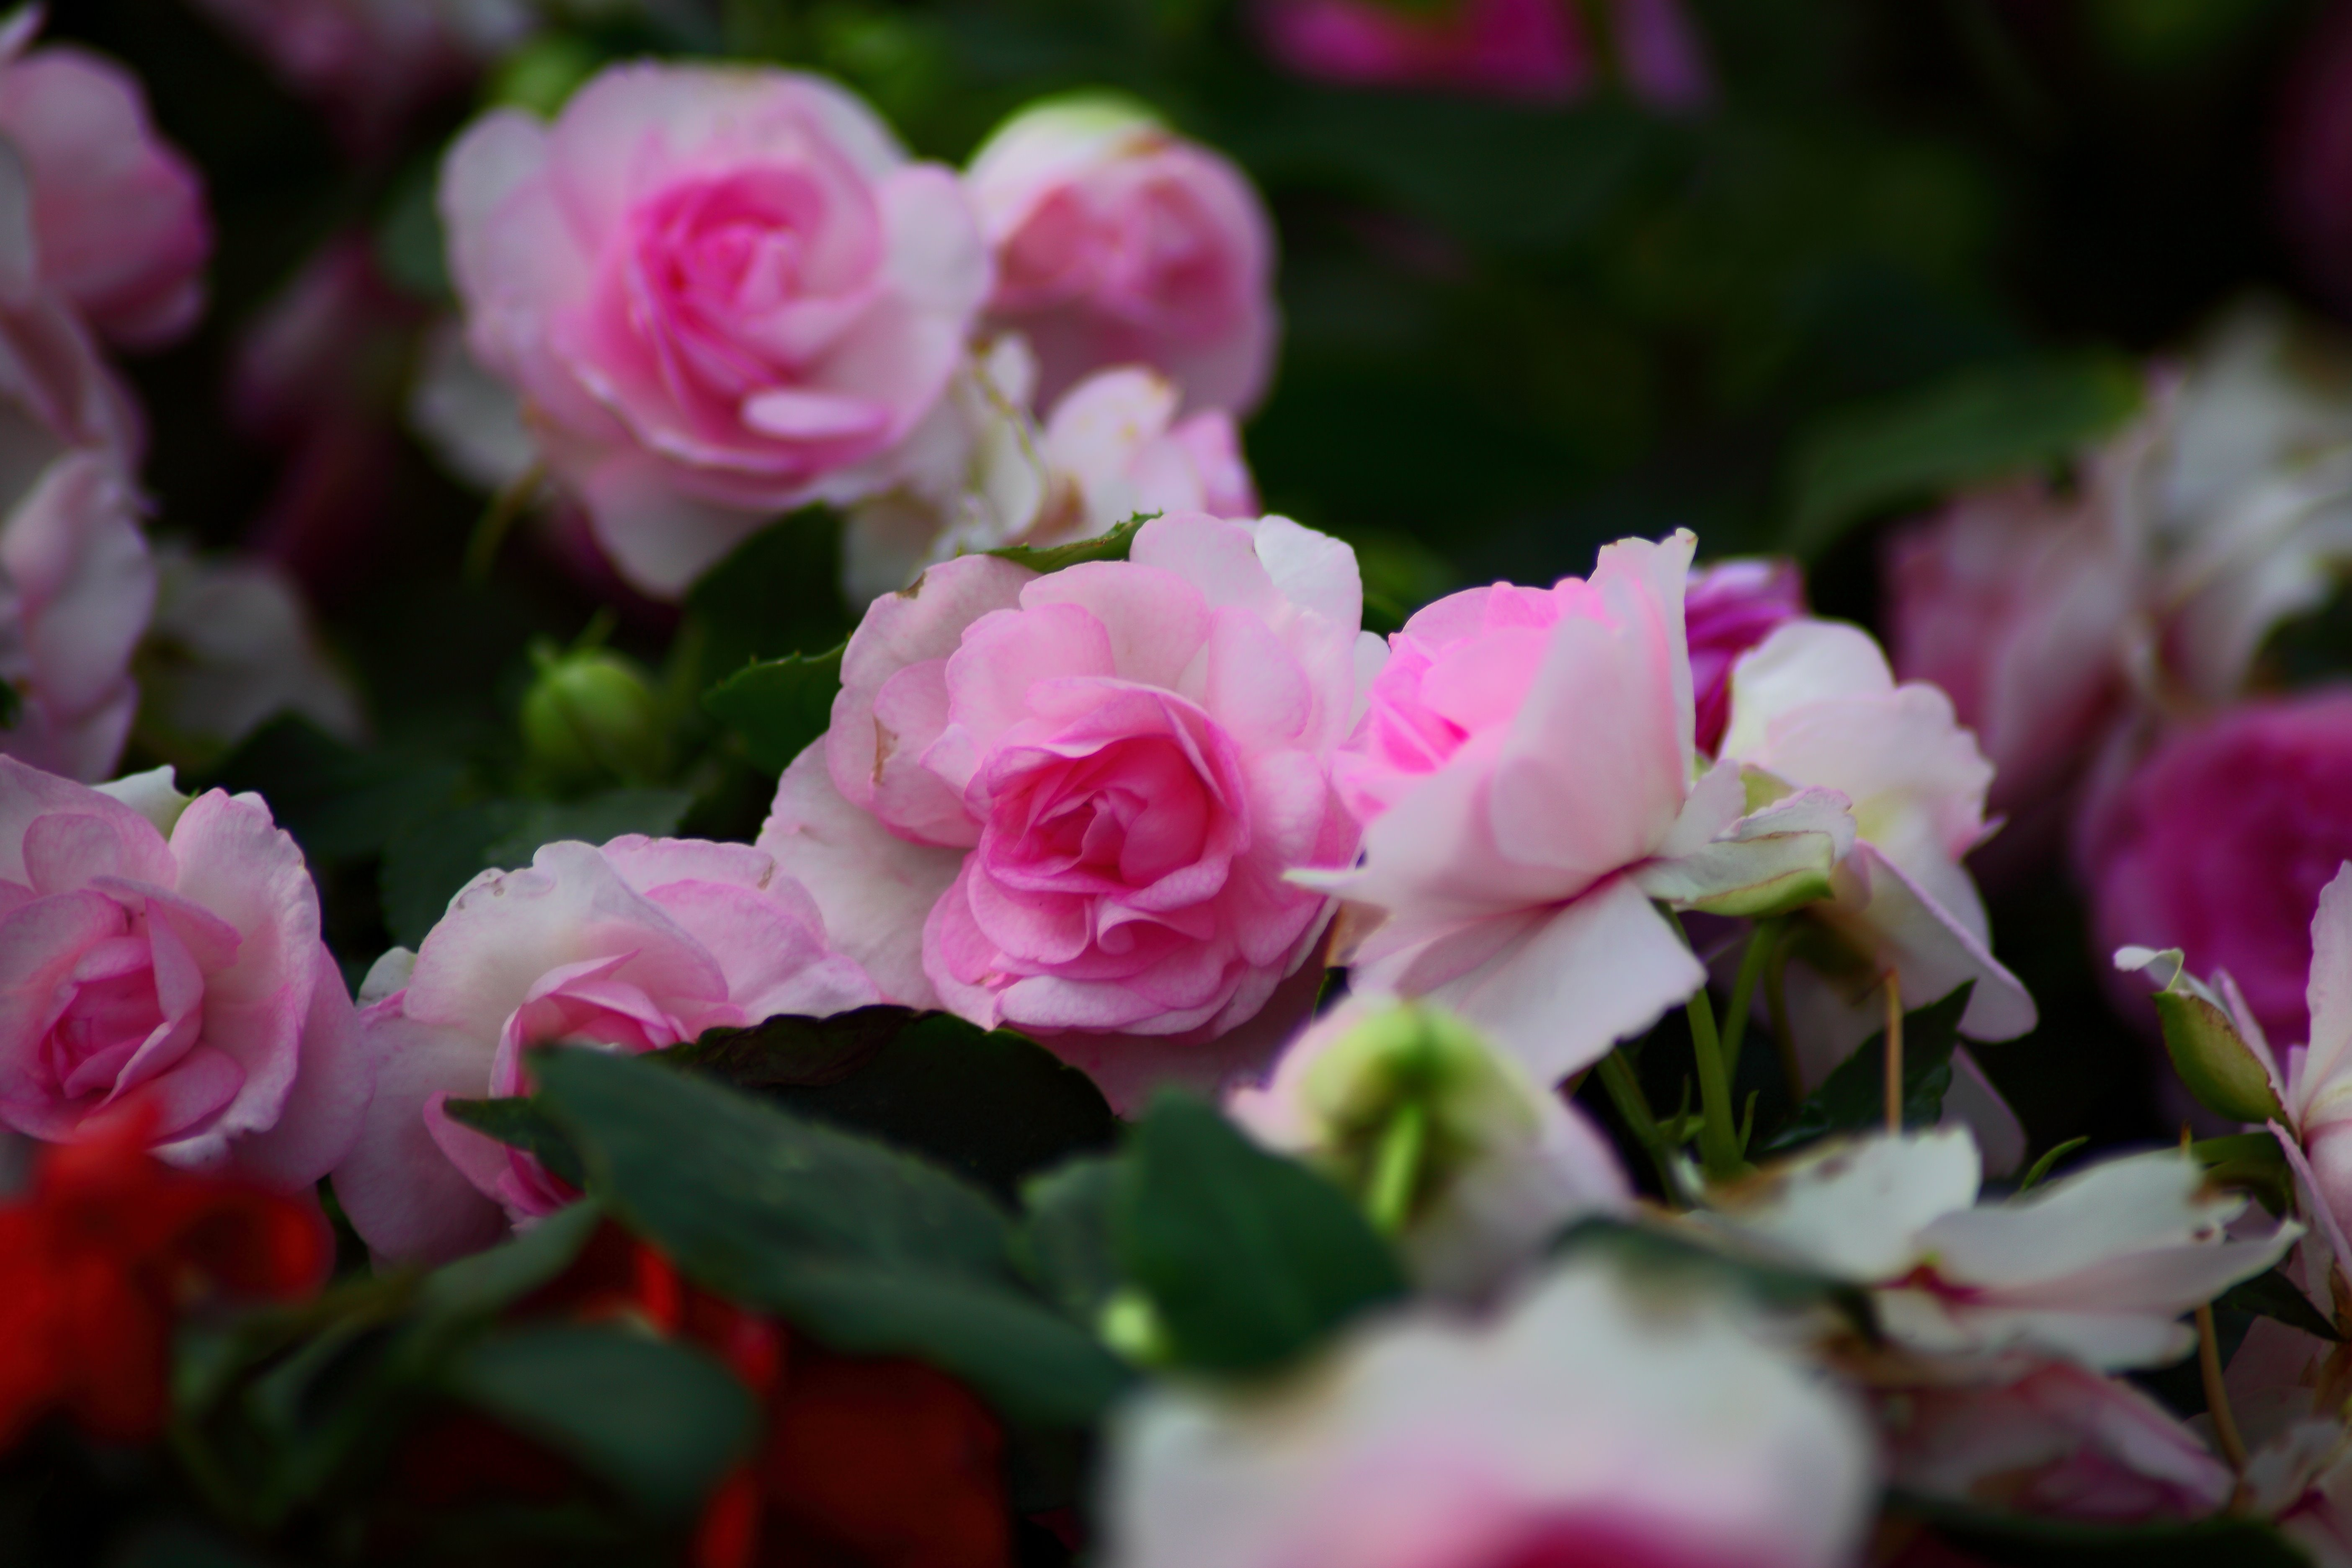 Rose Bush 5k Retina Ultra Hd Wallpaper Background Image